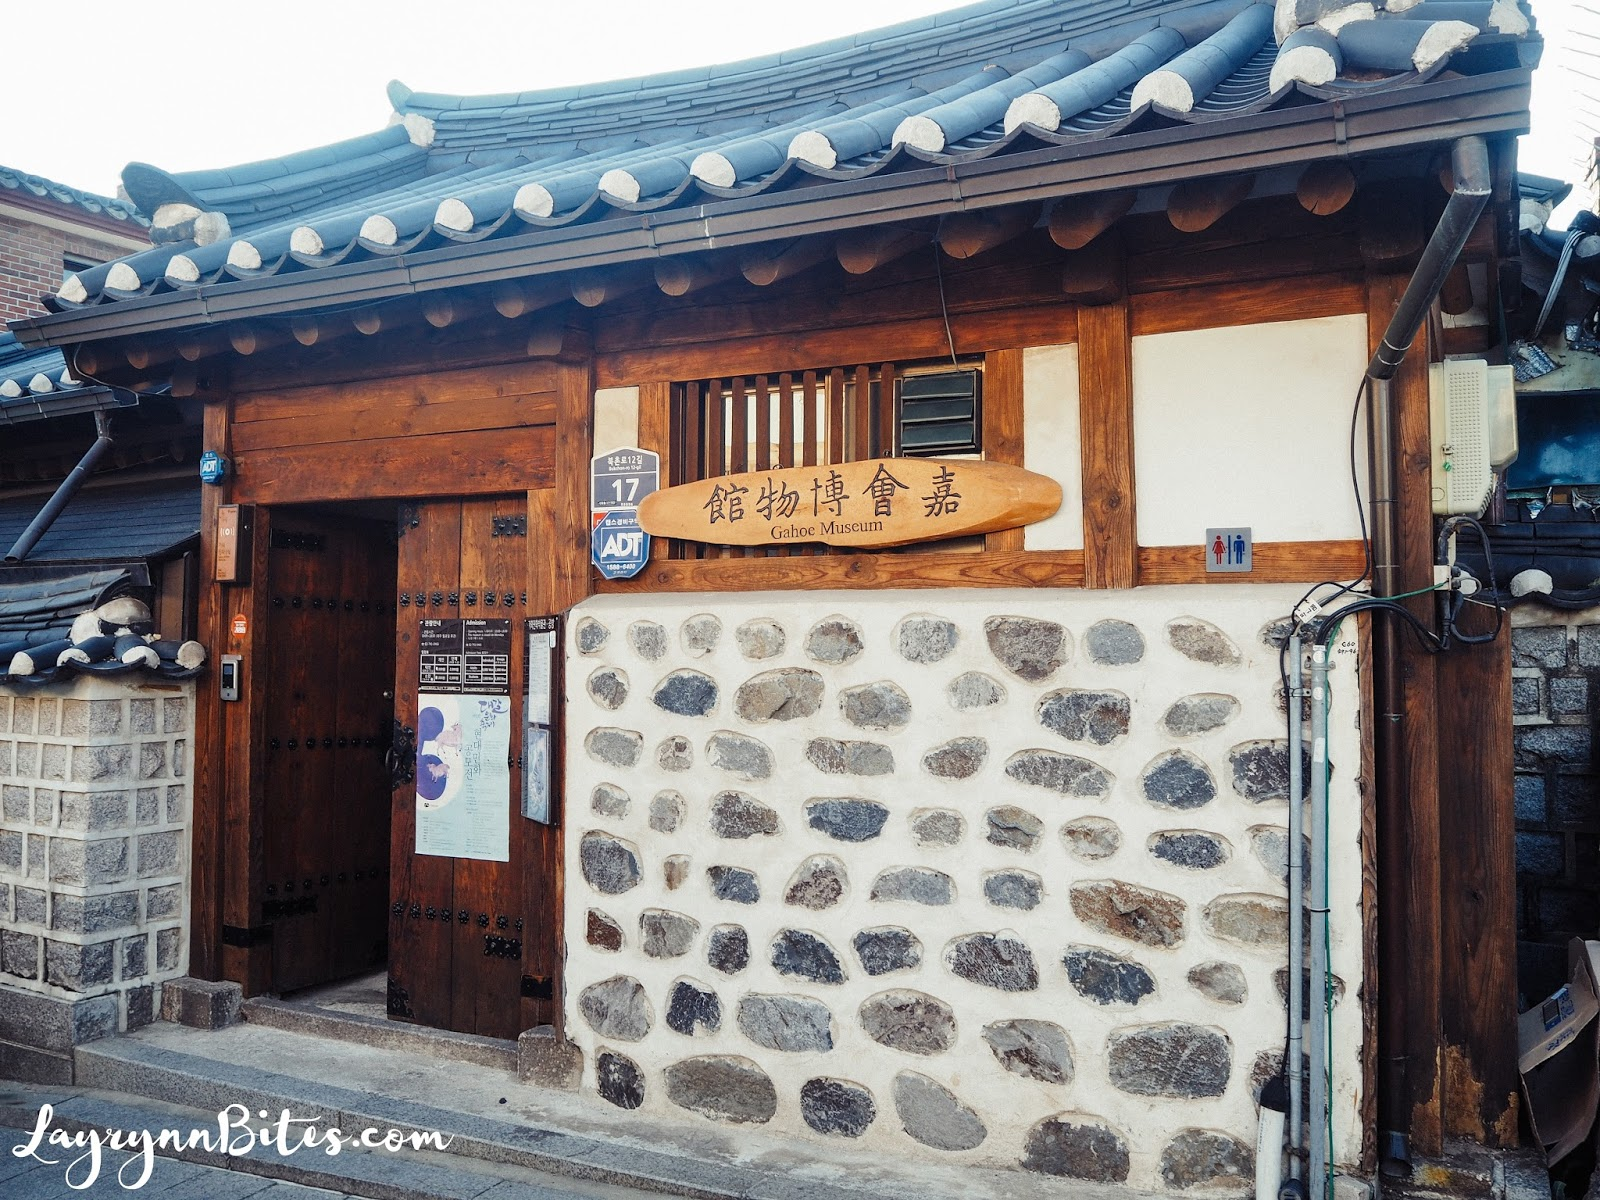 Ihwa mural village seoul korea carmen layrynn for Mural village seoul